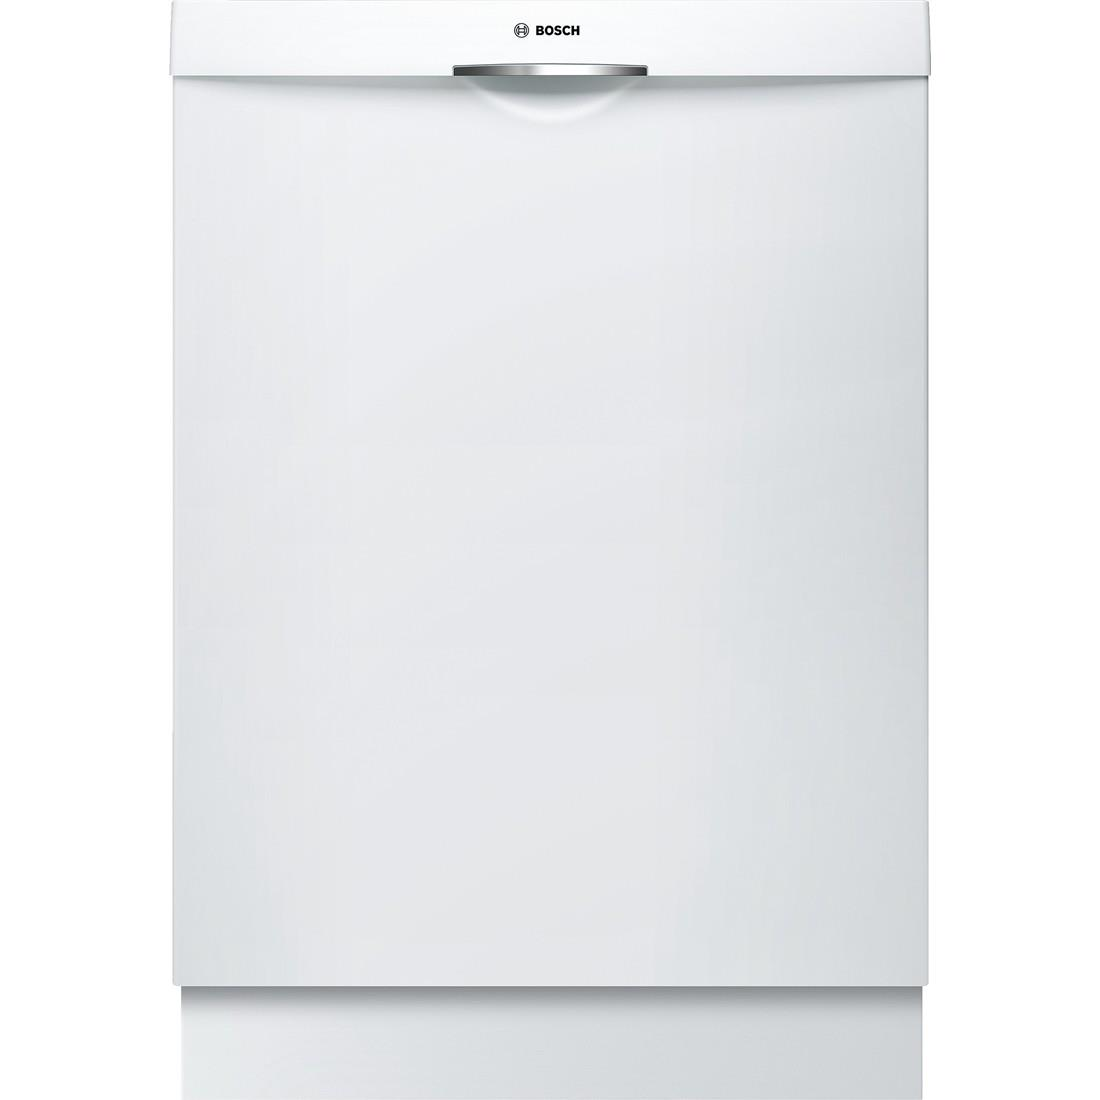 "Bosch Dishwashers 24"" Built-In Tall Tub Dishwasher - Item Number: SHS5AV52UC"